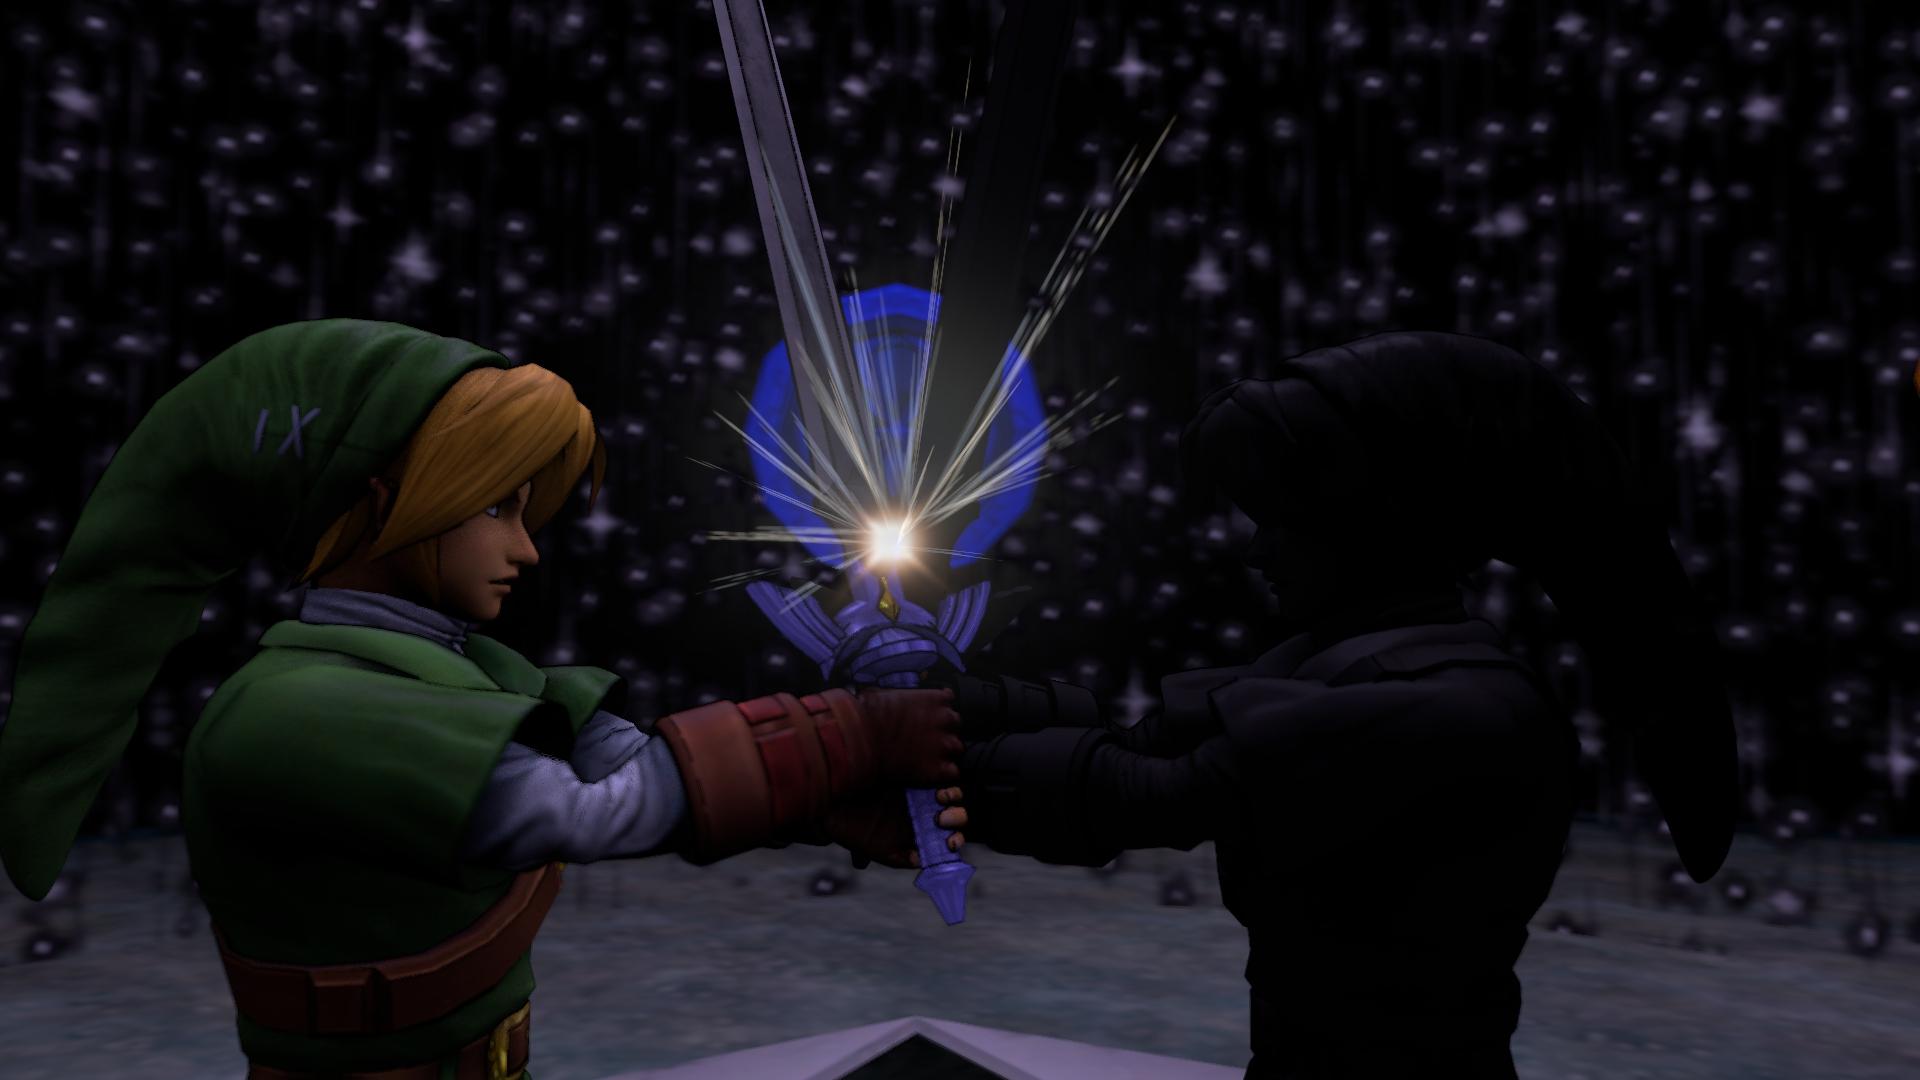 the legend of zelda link vs dark link by gamingbayside